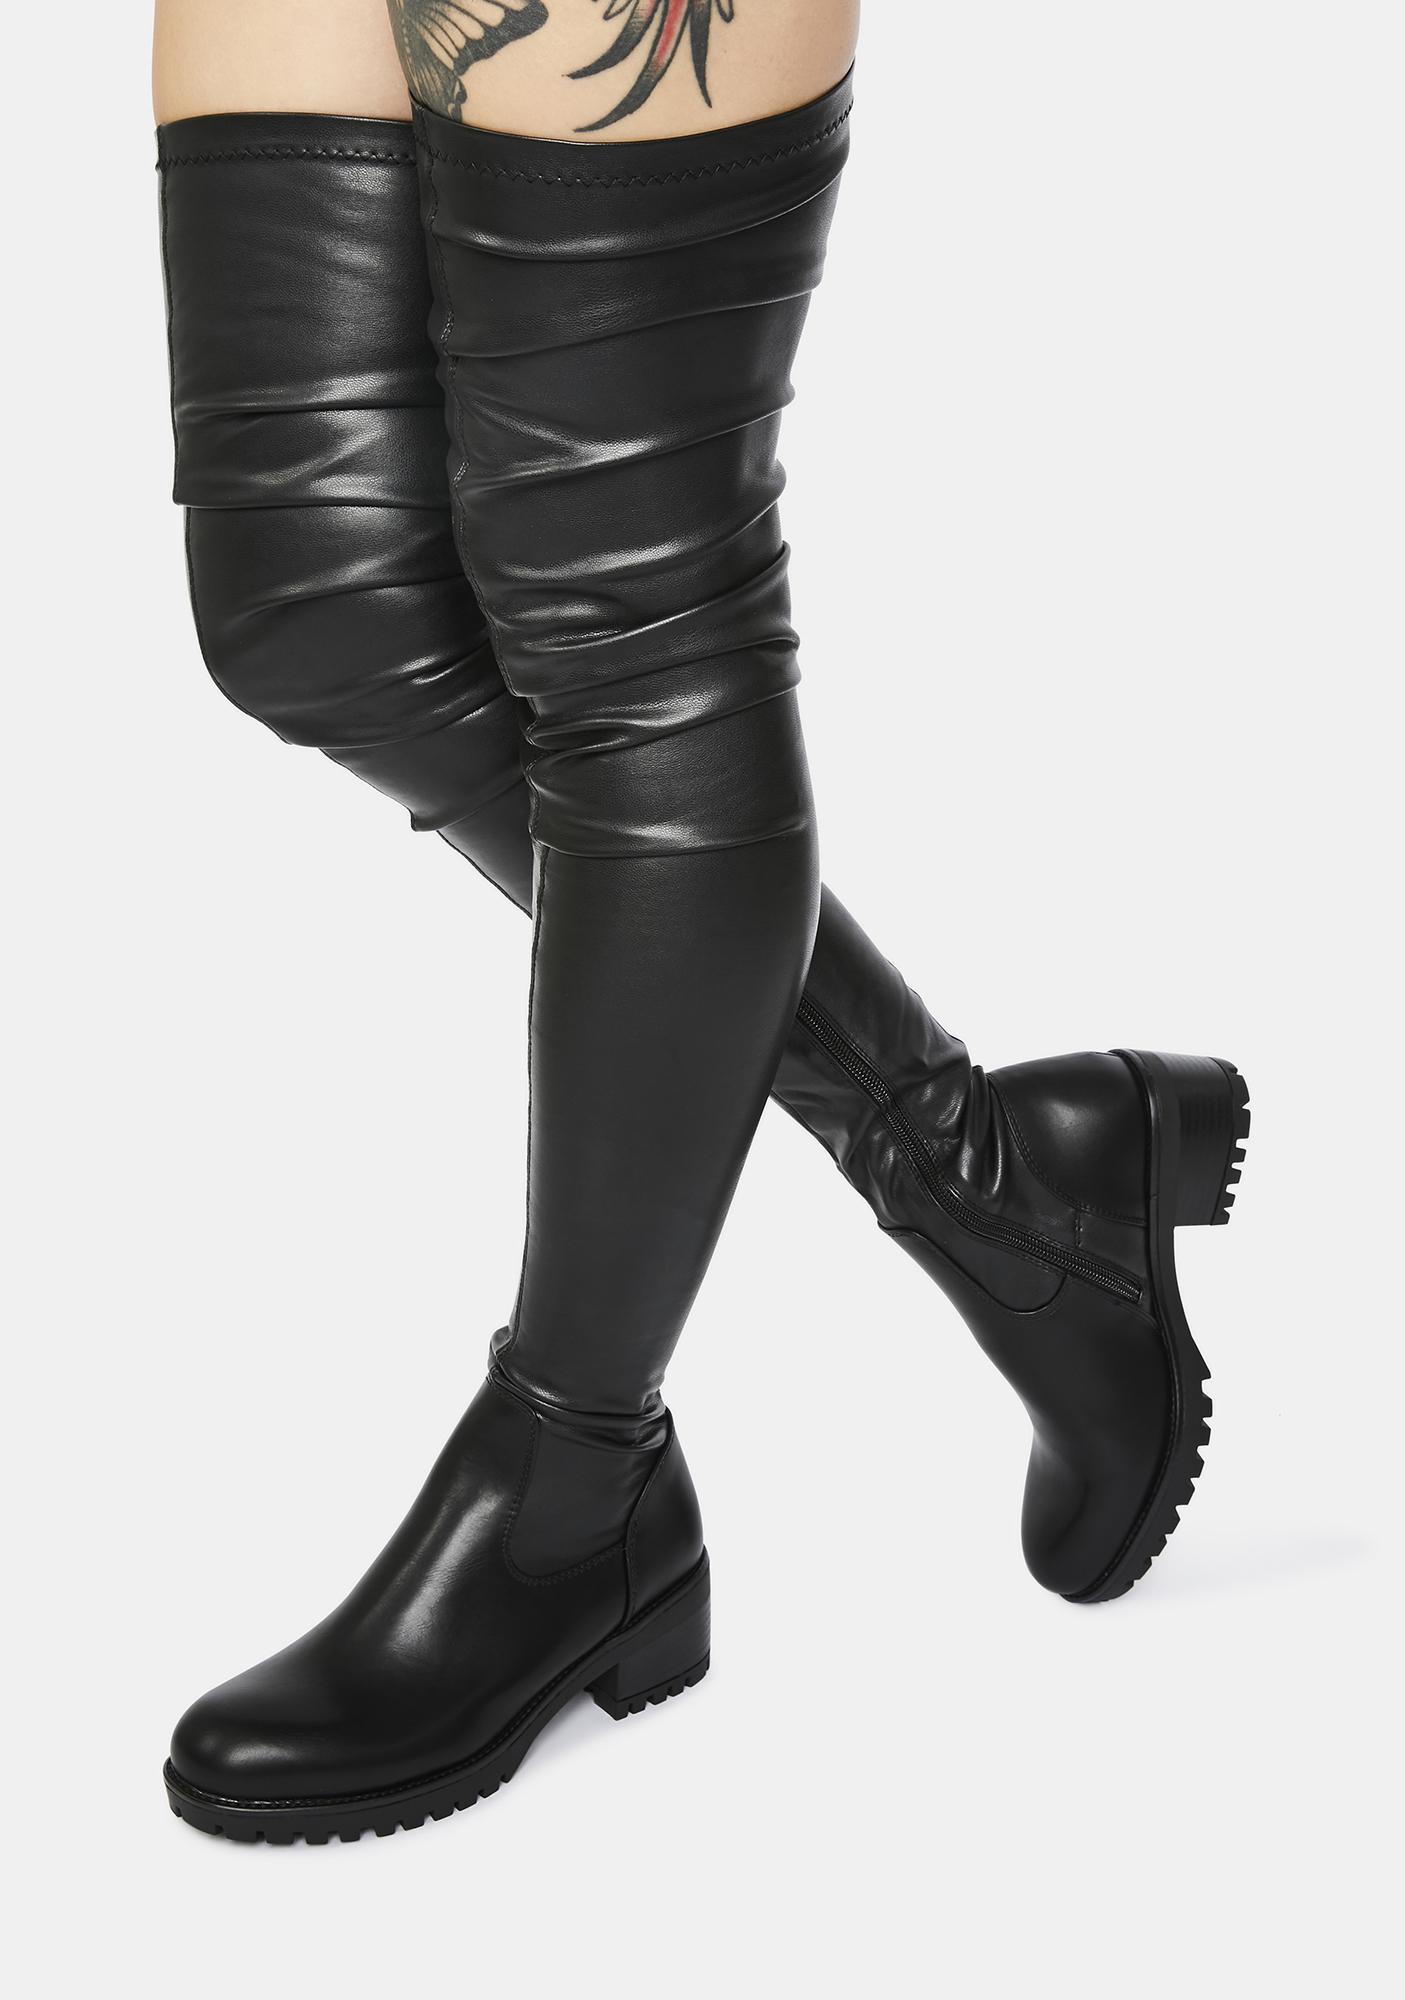 AZALEA WANG Surgical Slim Fit Thigh High Boots